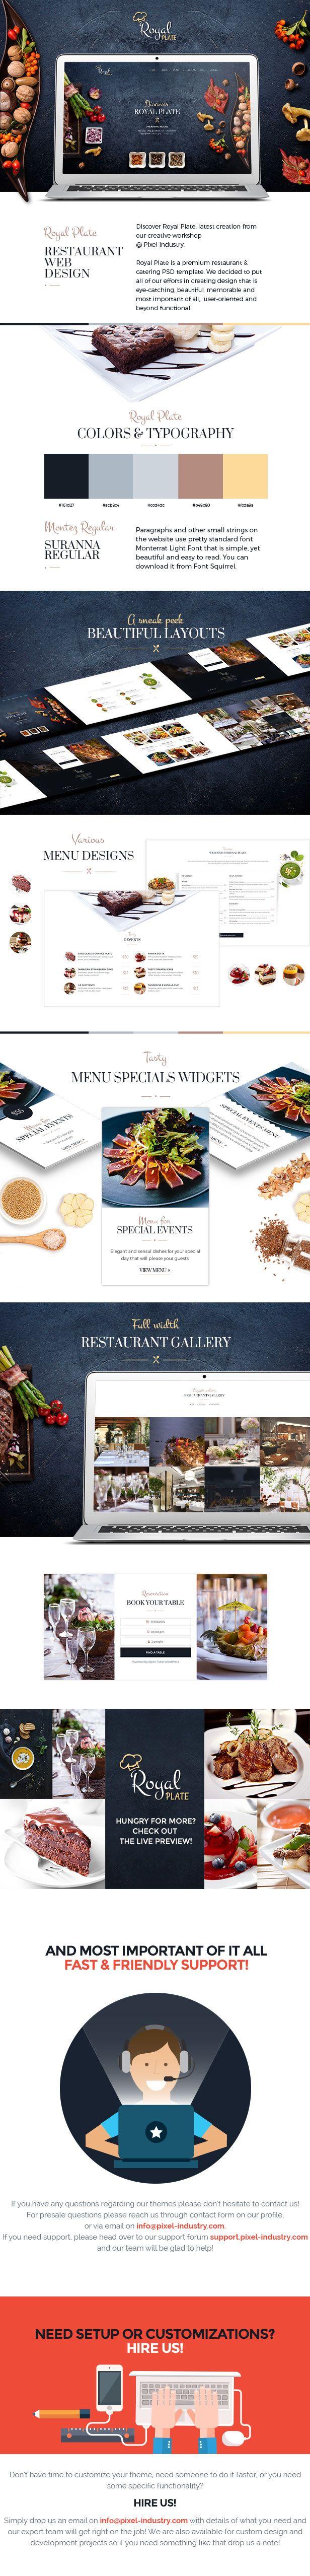 50 Best Html Restaurant Website Templates Images On Pinterest Free